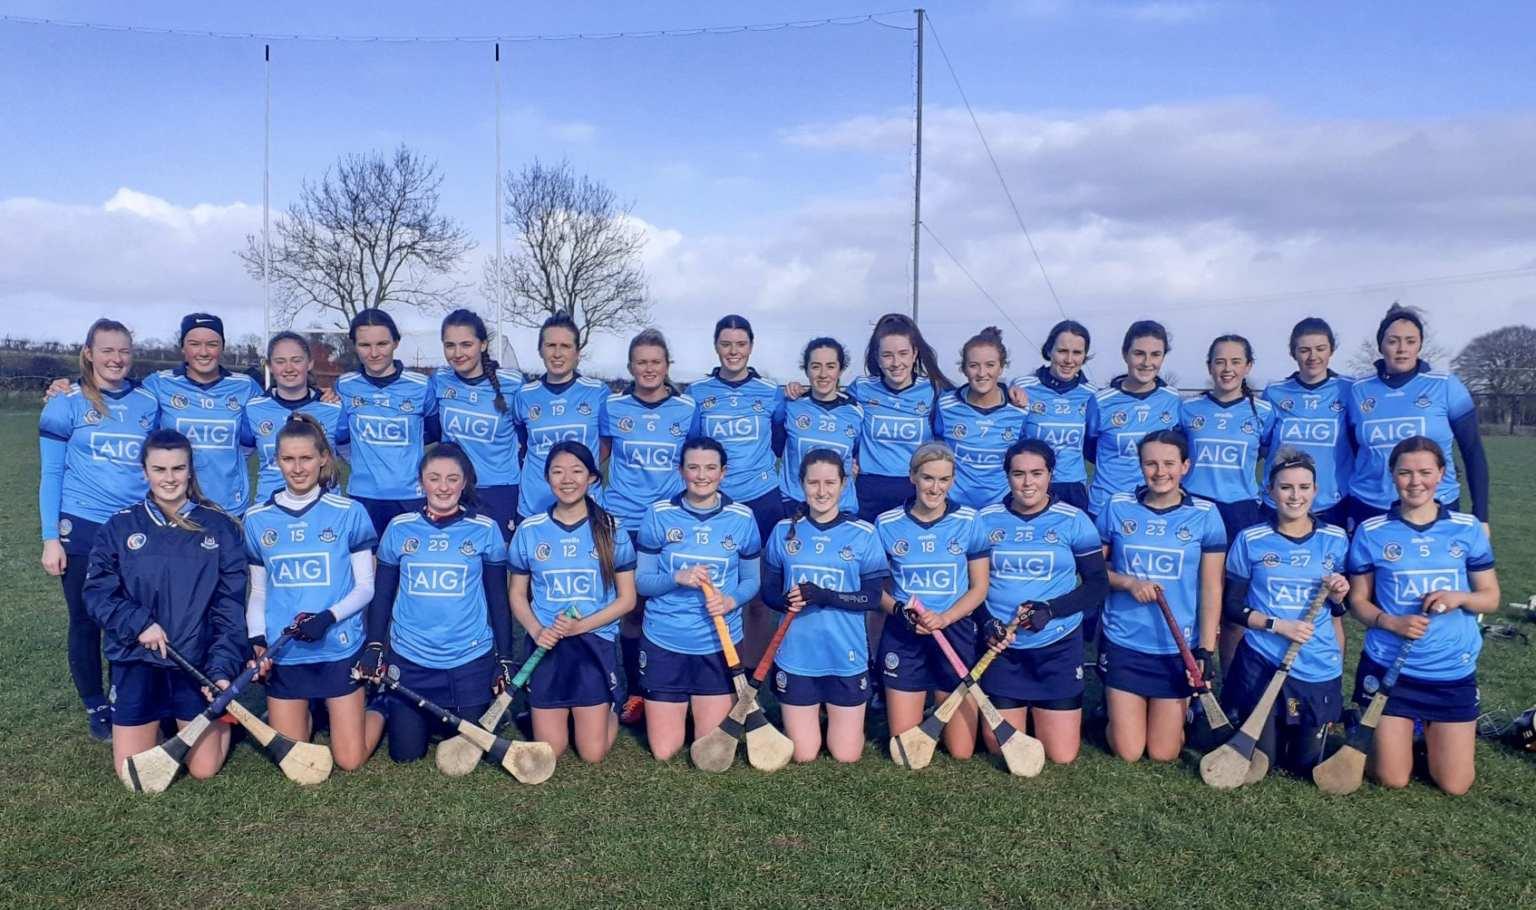 The Dublin Camogie Intermediate Team who play Laois in a vital league game